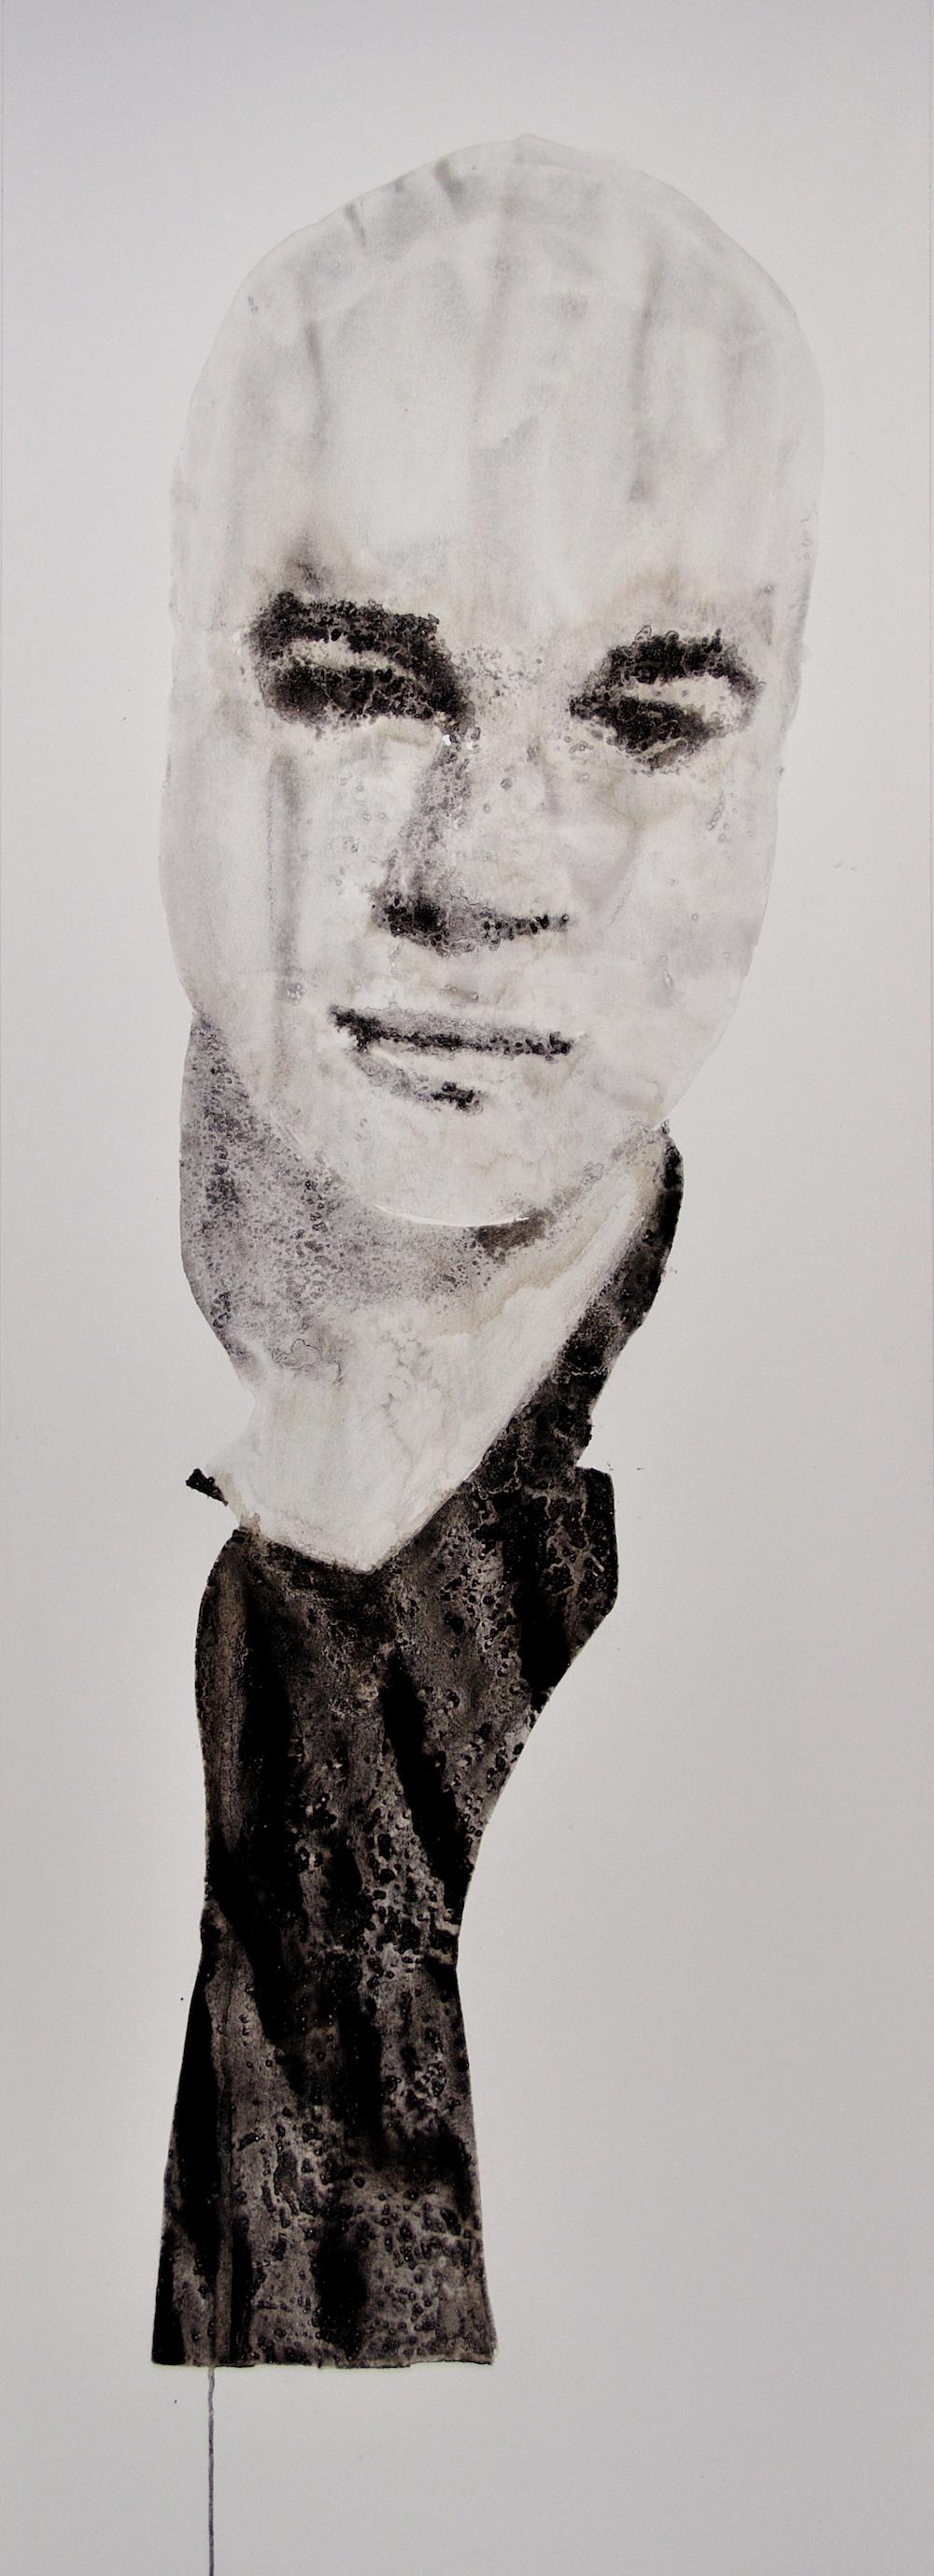 Denis W. Bender